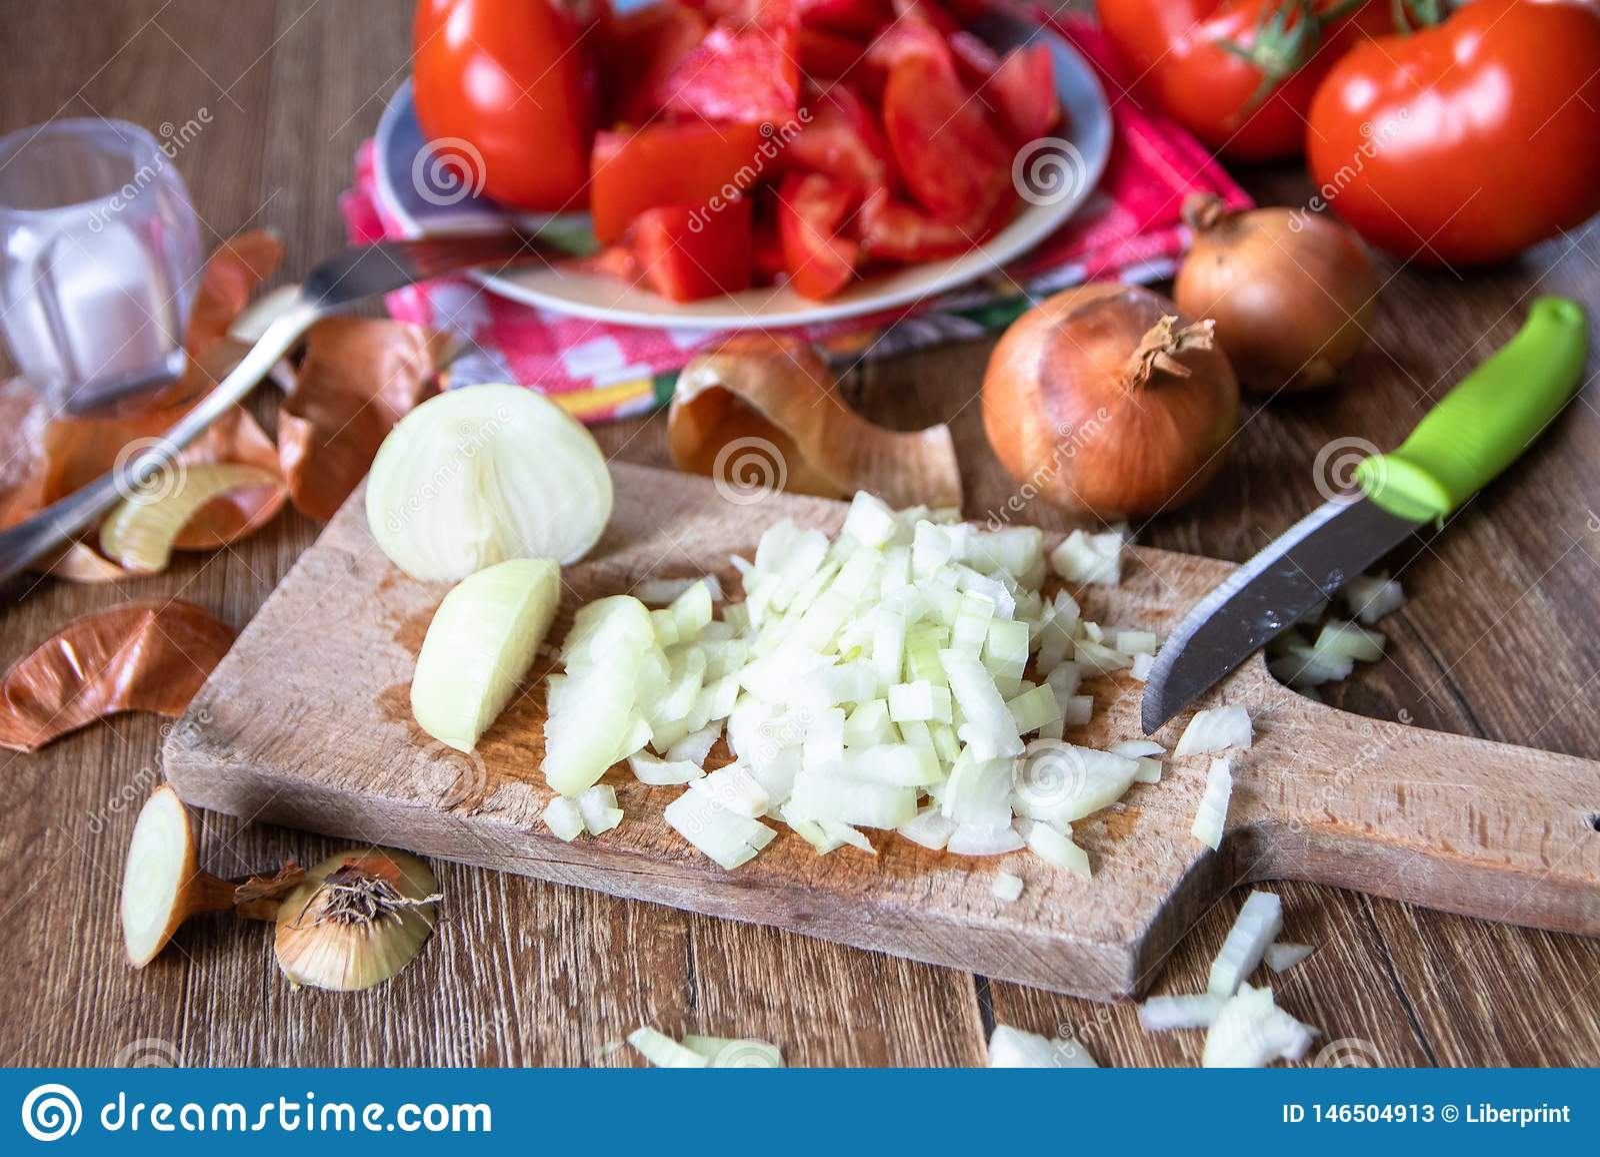 Pokrojona cebula na kuchni desce, ca?a cebula i pomidory w tle,